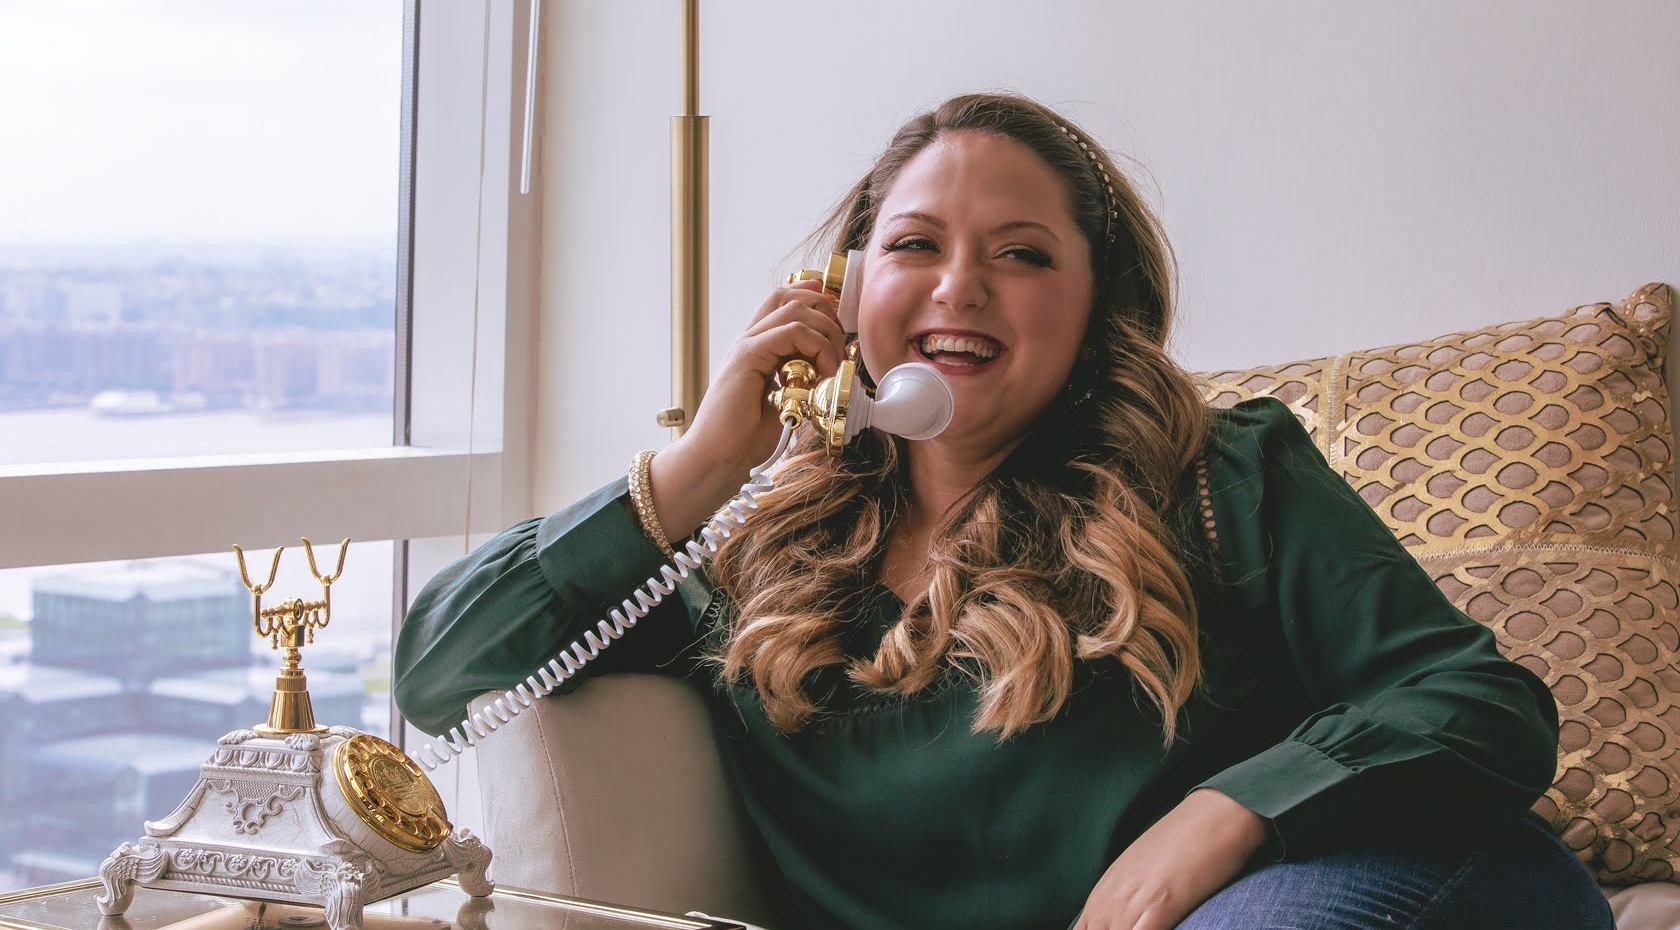 Nicole-Phone-laugh.jpg